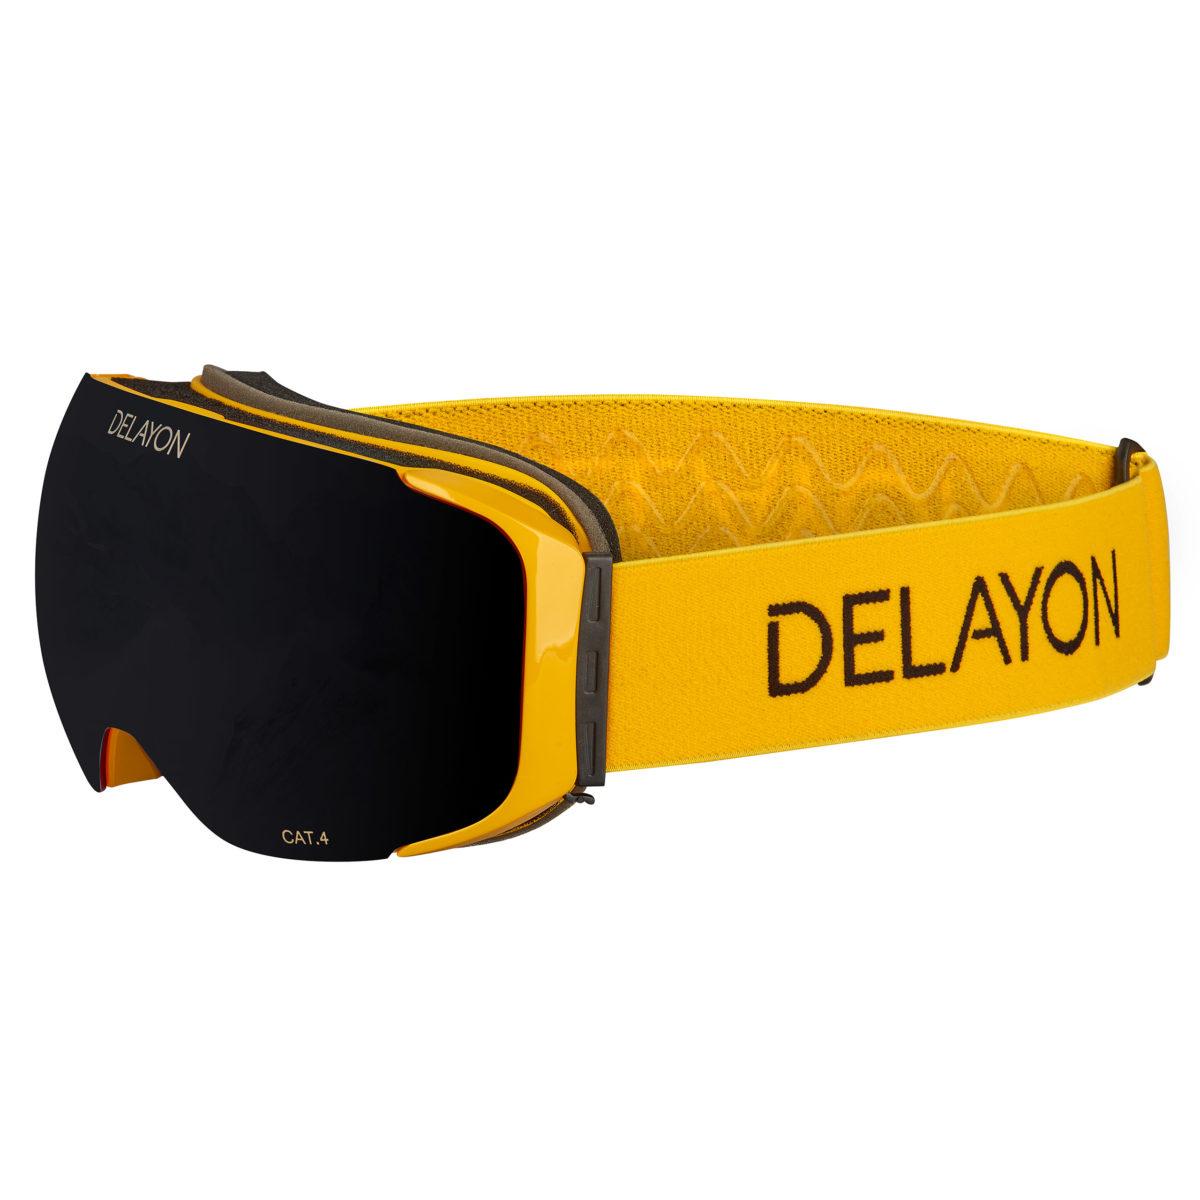 DELAYON Eyewear Explorer Goggle STRONG Black Hornet Yellow